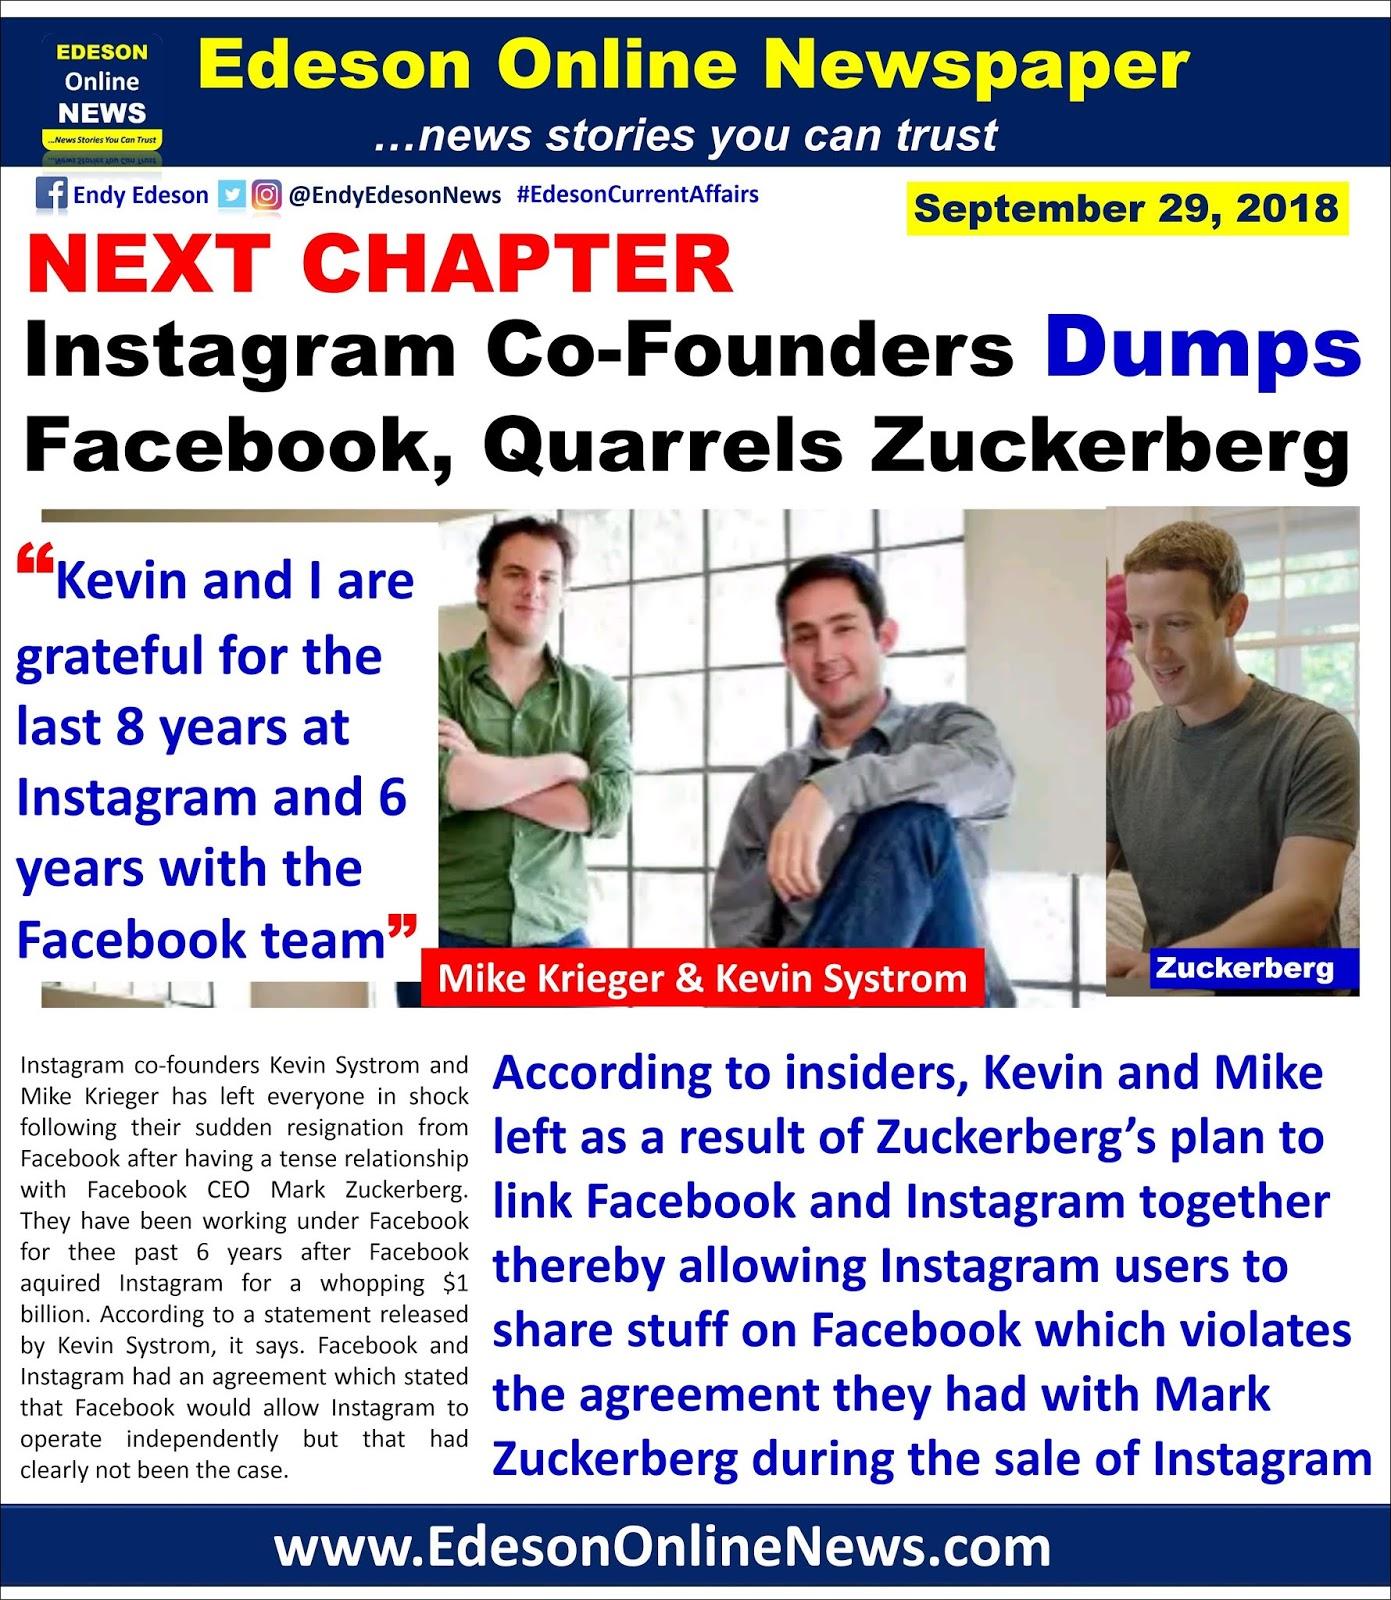 Edeson Online Newspaper Instagram Co Founders Dumps Facebook